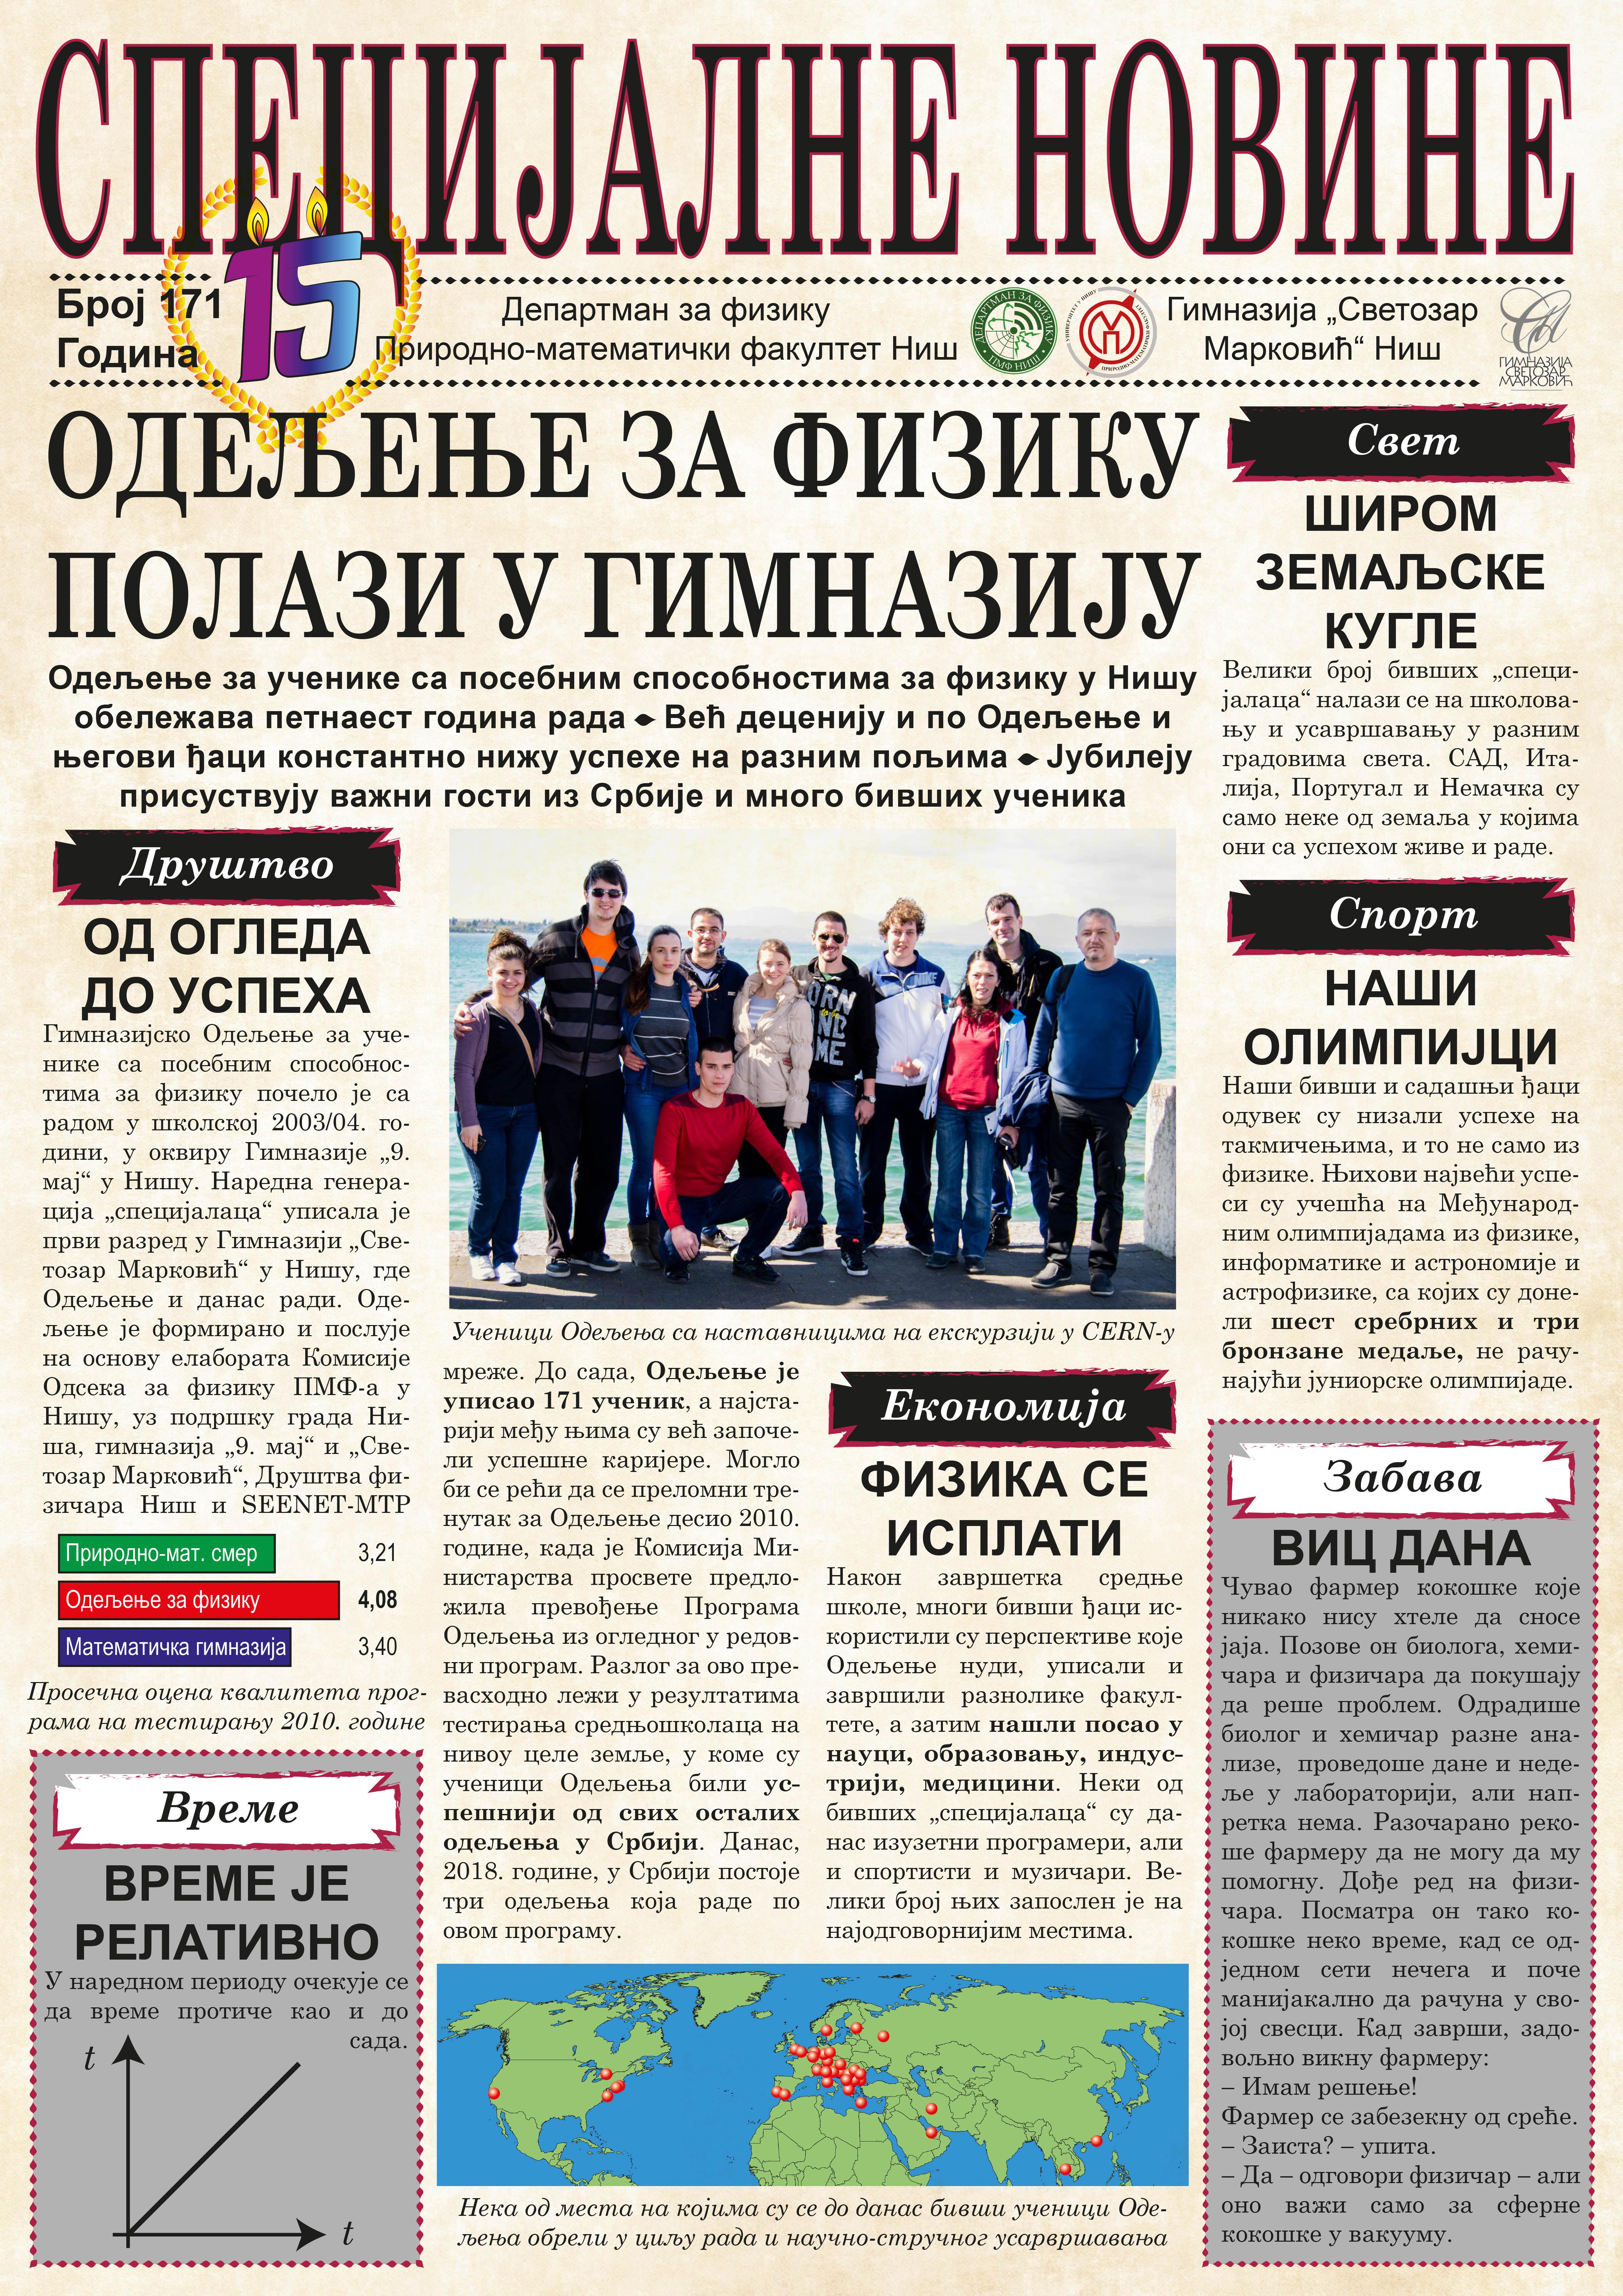 Novine_a2